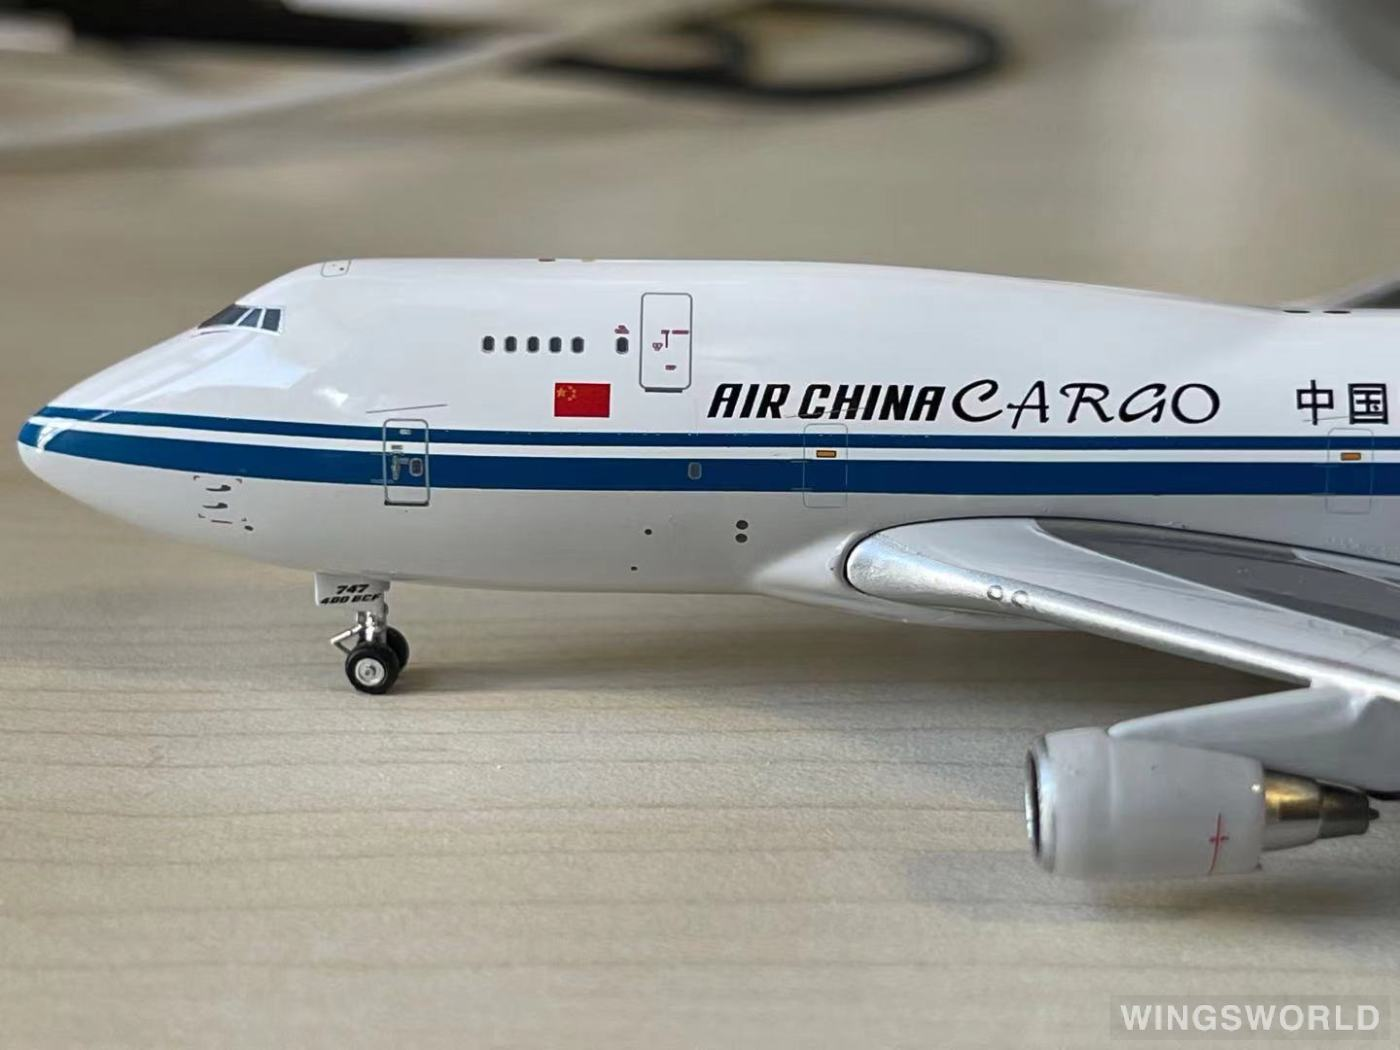 Phoenix 1:400 PH10323B Air China Cargo 中国国际货运航空 Boeing 747-400 B-2477